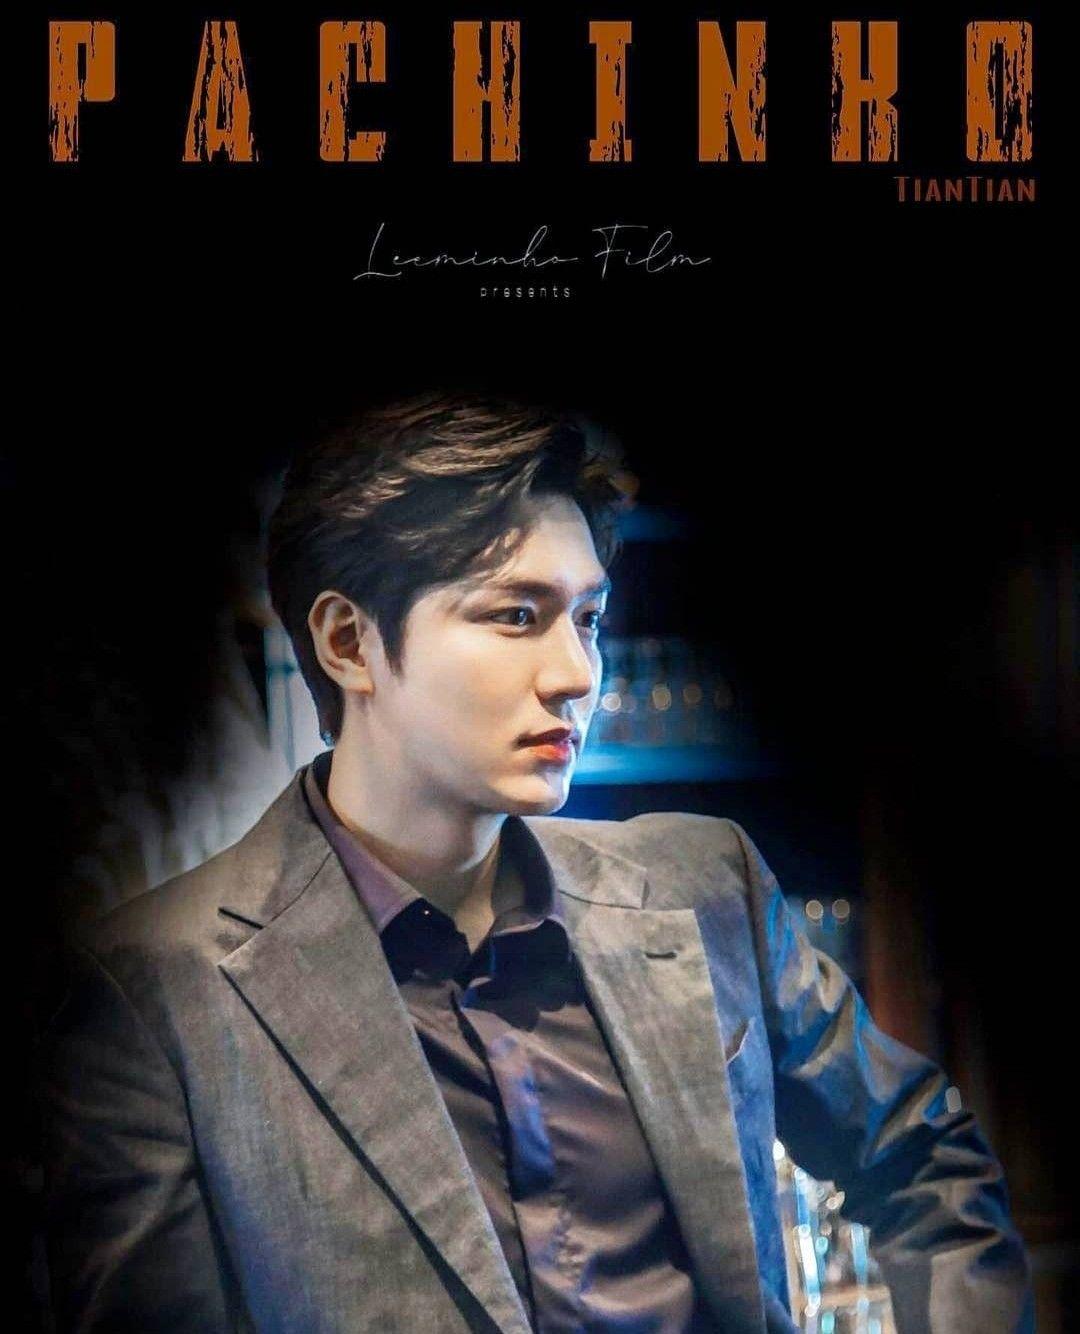 Hansu Is Short For Handsome Pachinko Fan Made Lee Min Ho Lee Min Ho Photos Lee Min Ho News